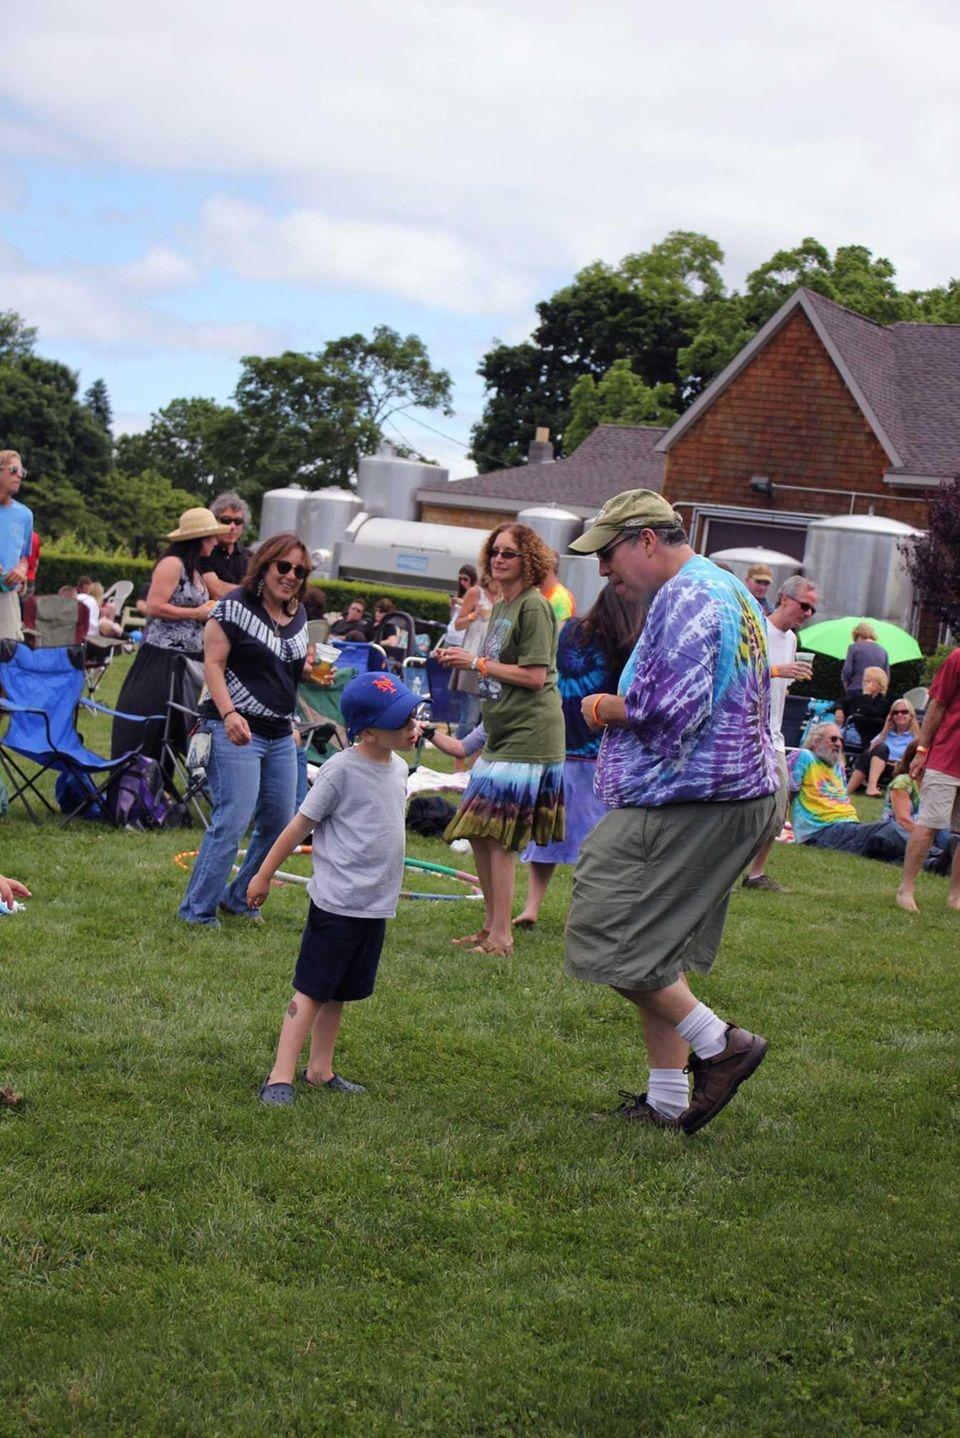 Mineola resident Gary Solomon, 44, dances with his